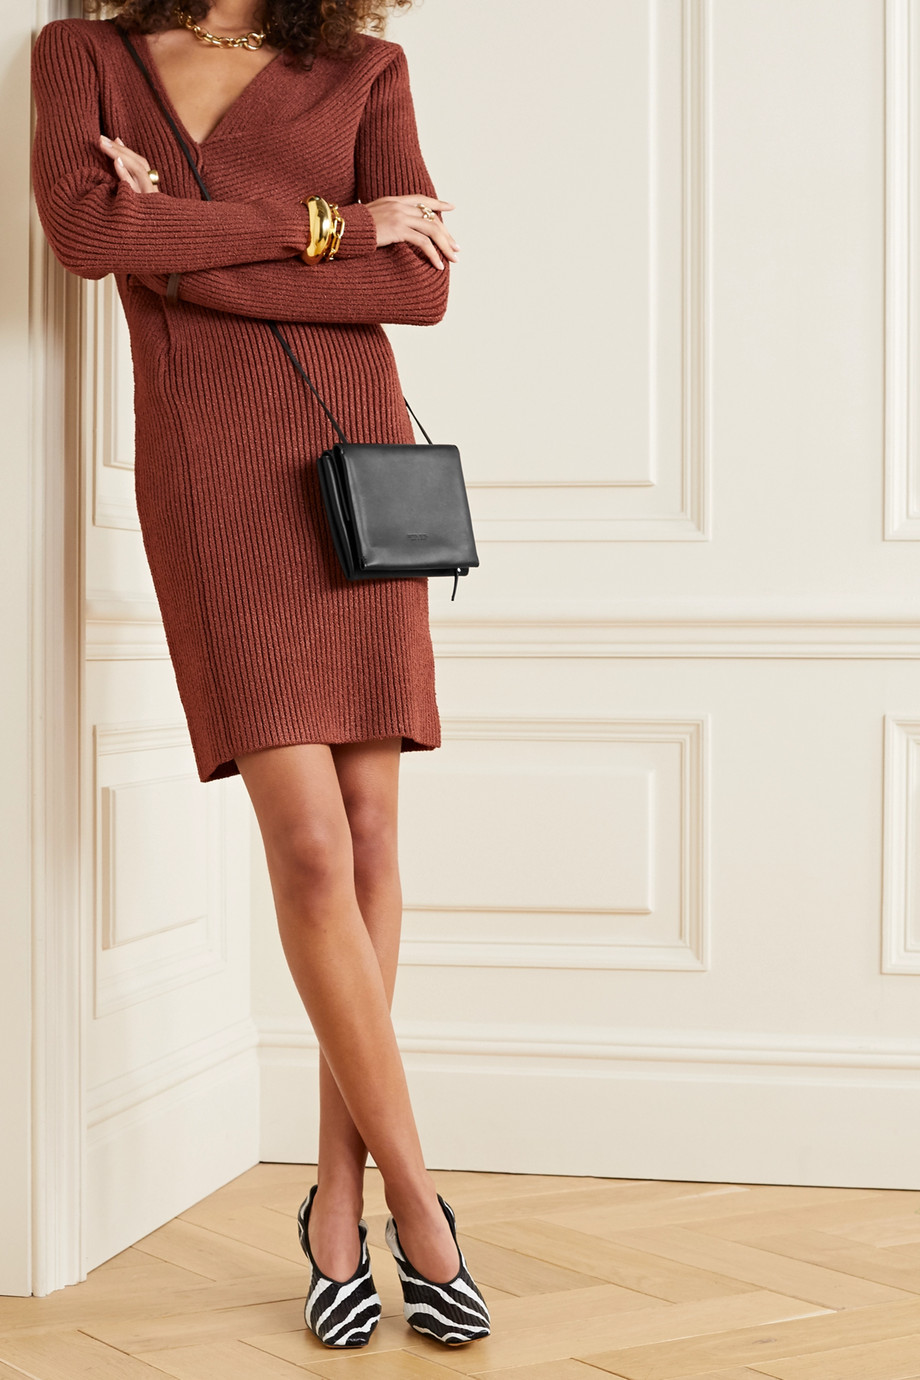 Bottega Veneta Trio leather shoulder bag